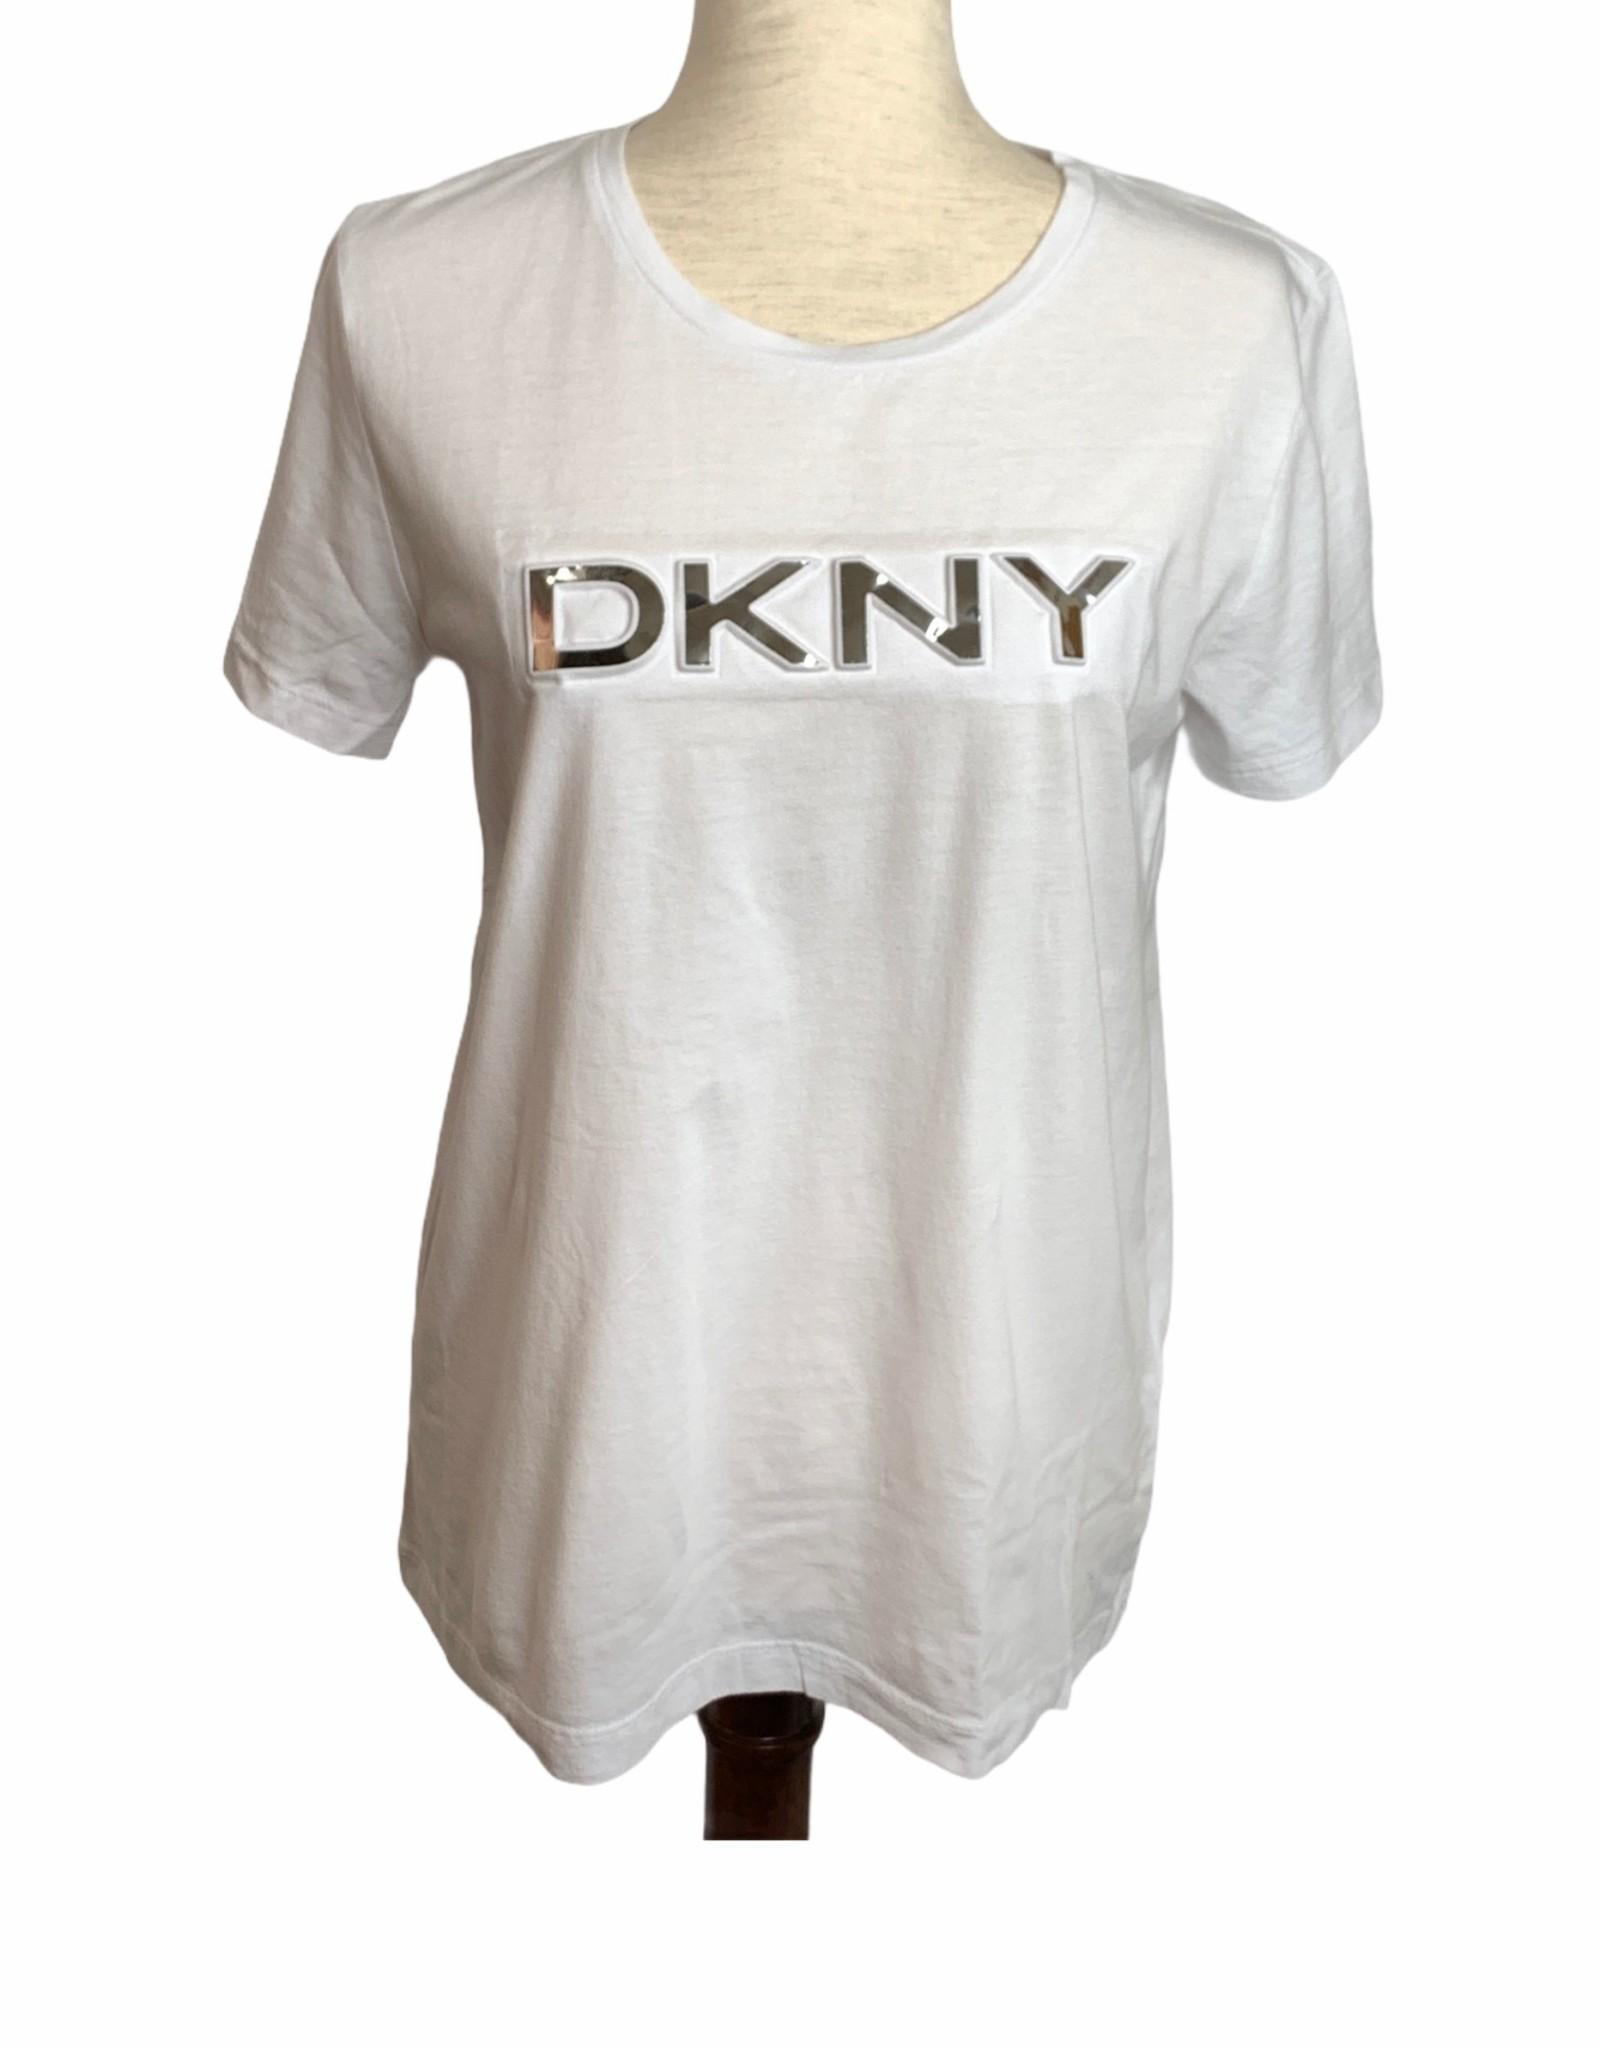 DKNY DKNY Metallica Box Logo T-Shirt